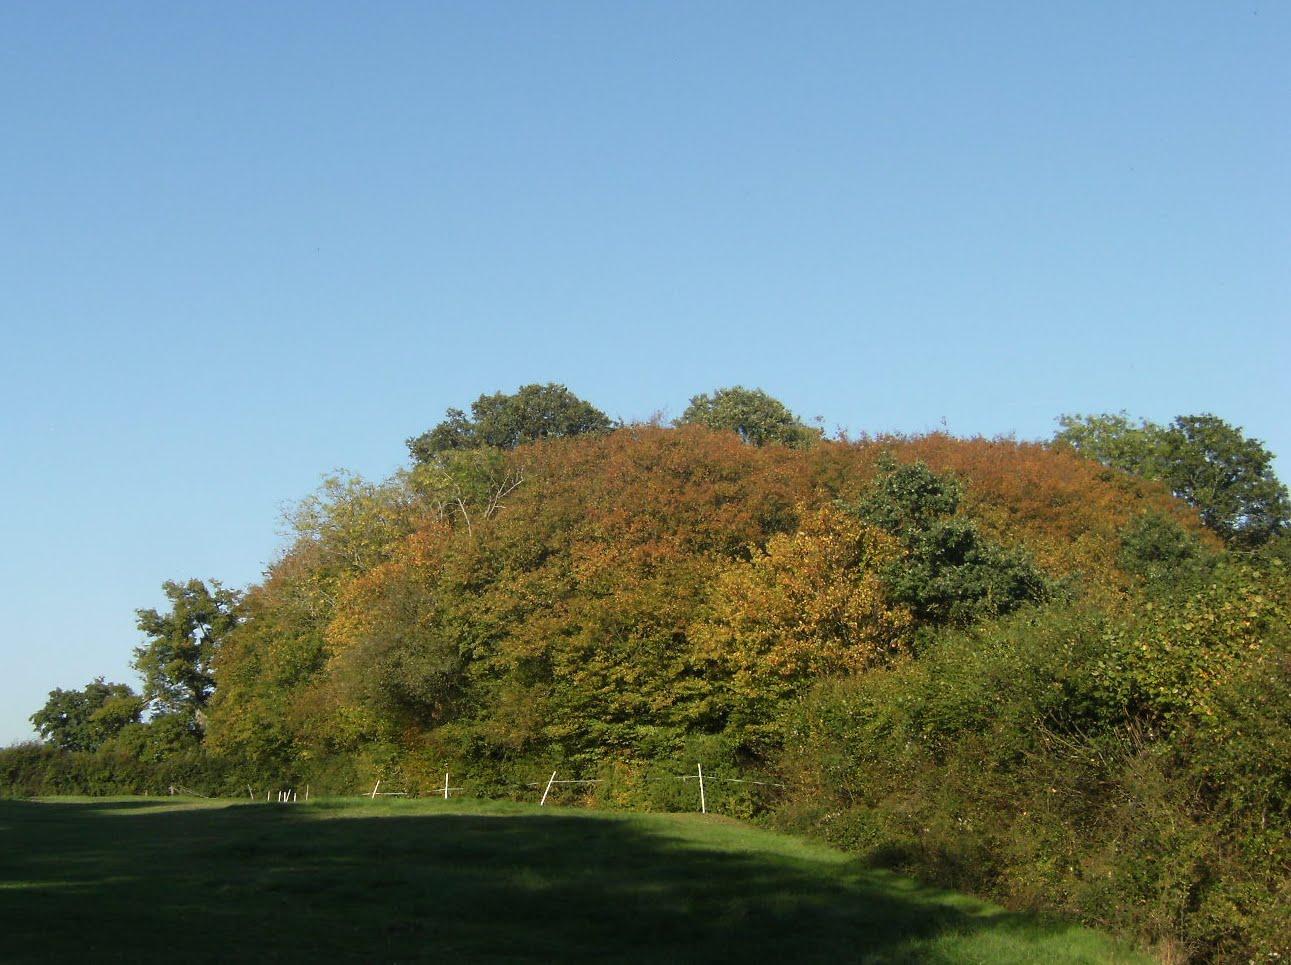 DSCF9878 Early autumn colours